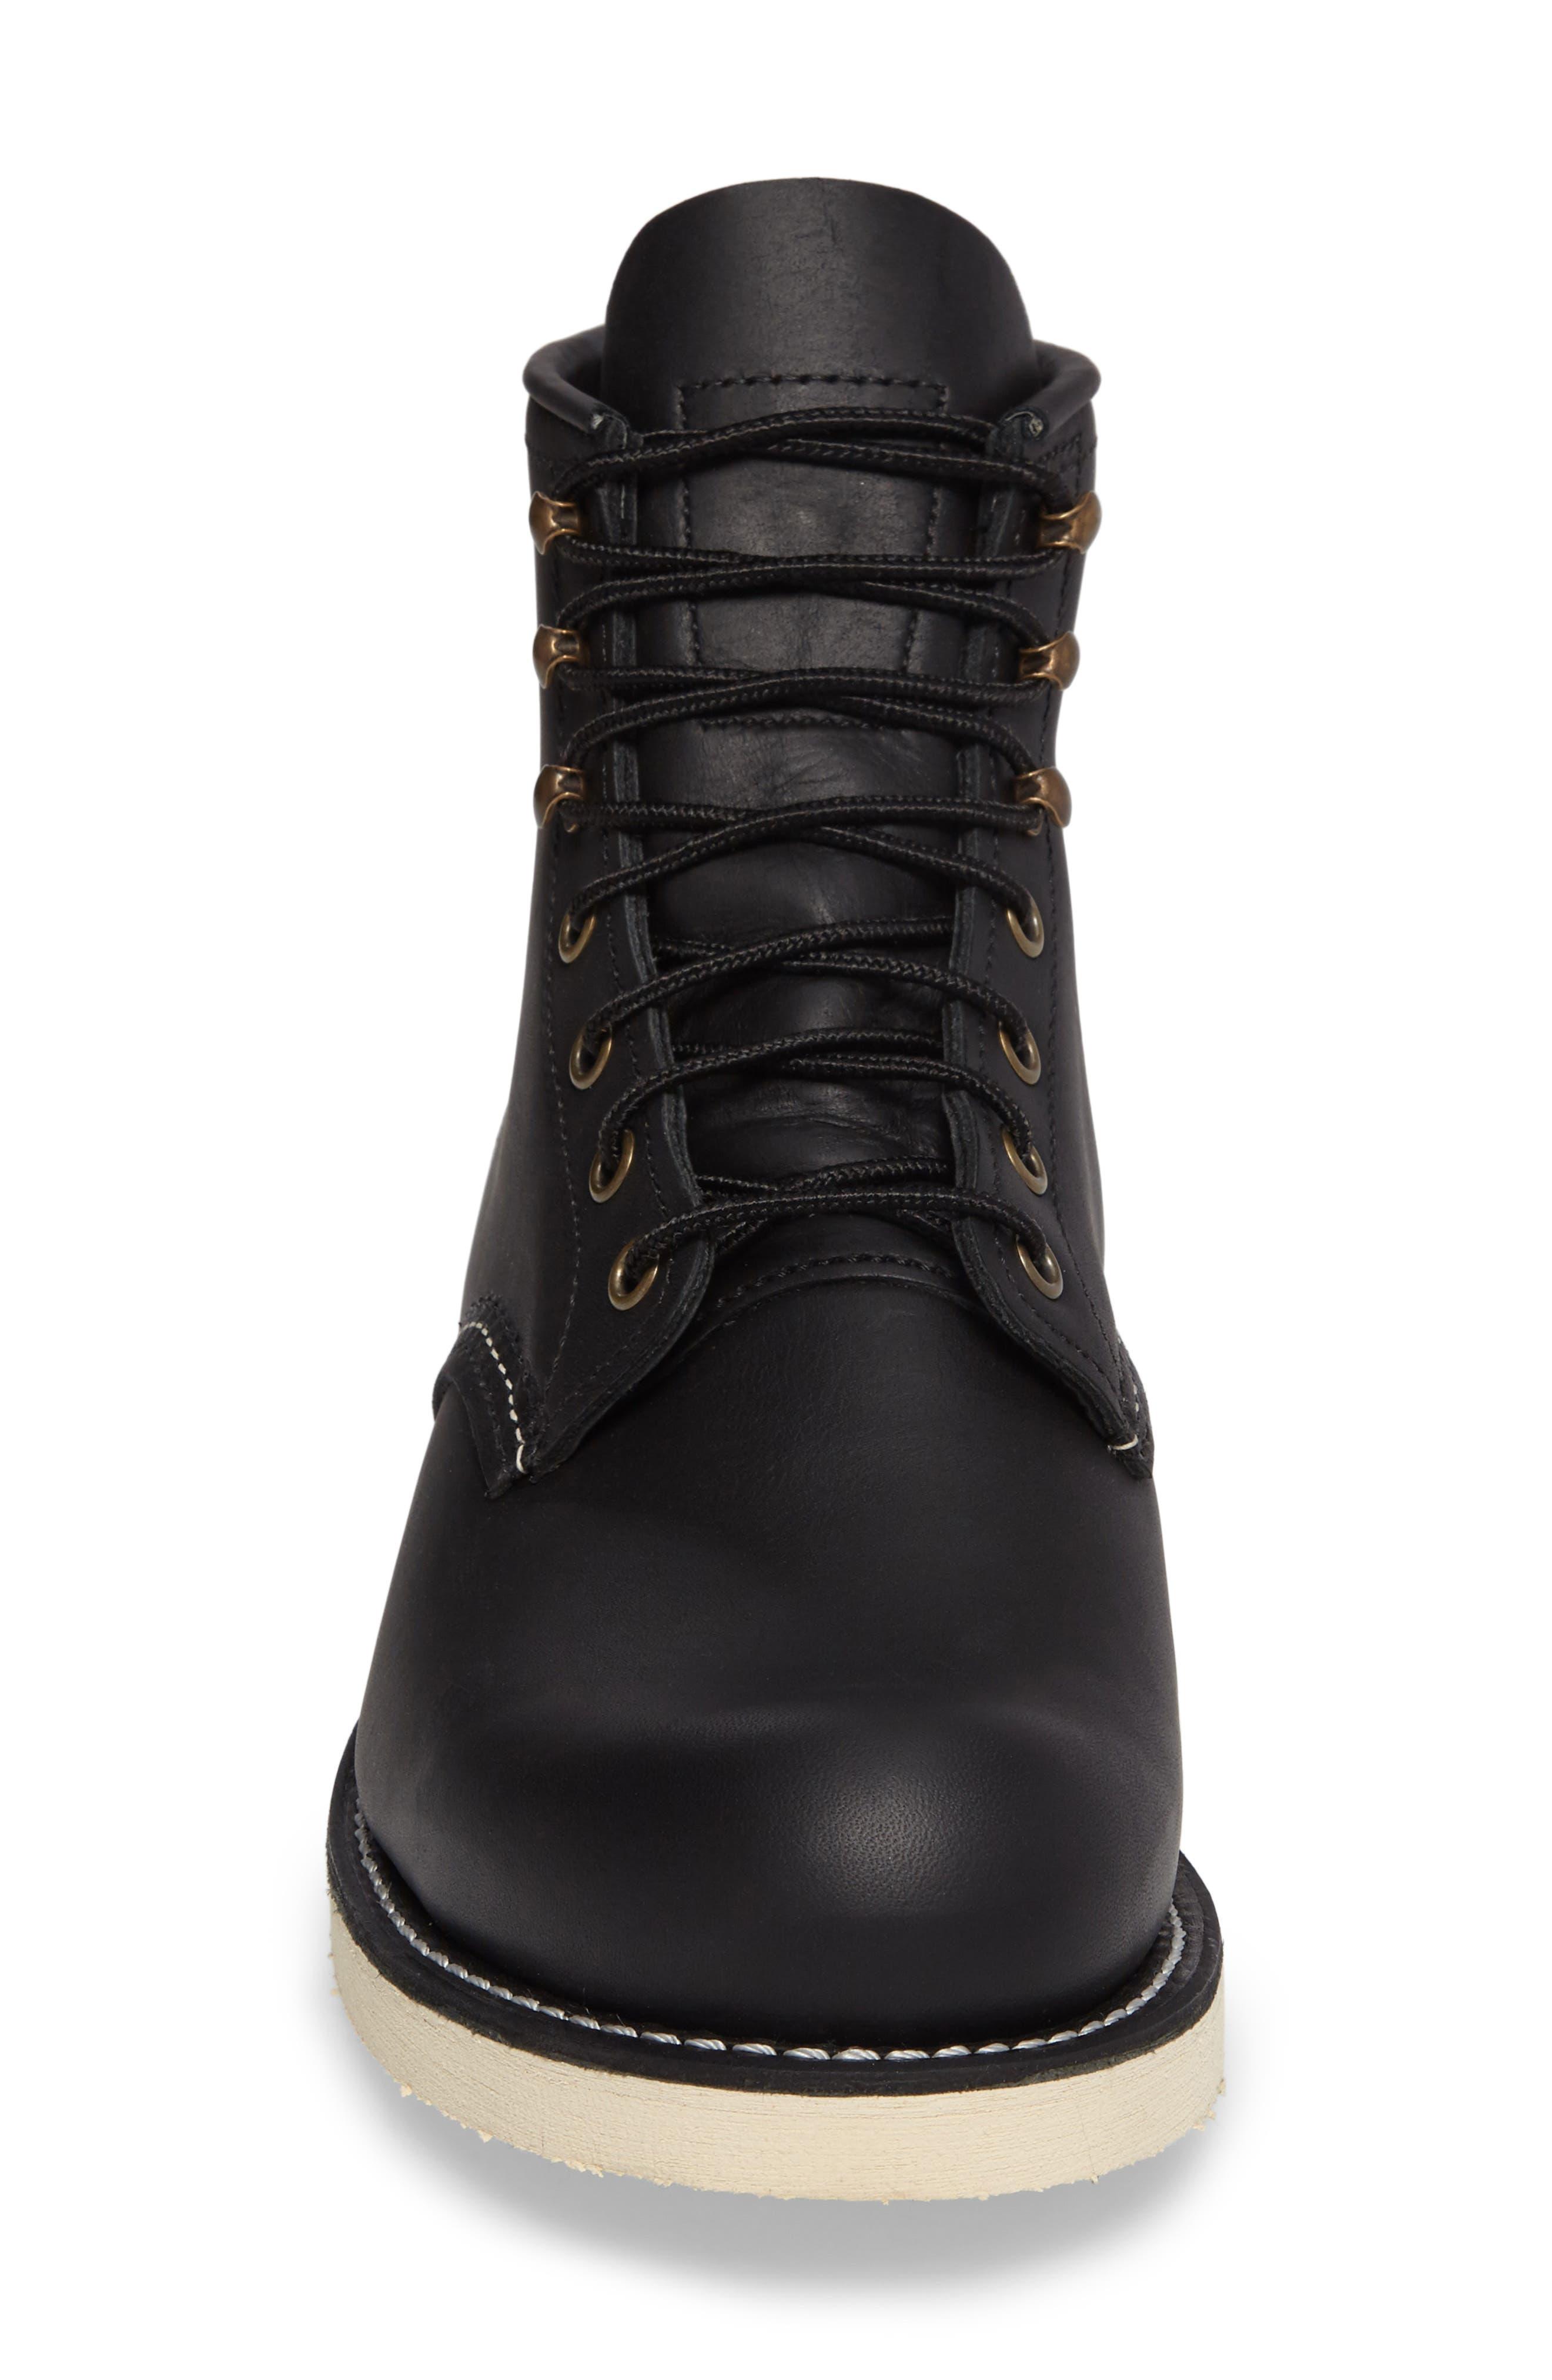 Rover Plain Toe Boot,                             Alternate thumbnail 4, color,                             BLACK HARNESS LEATHER